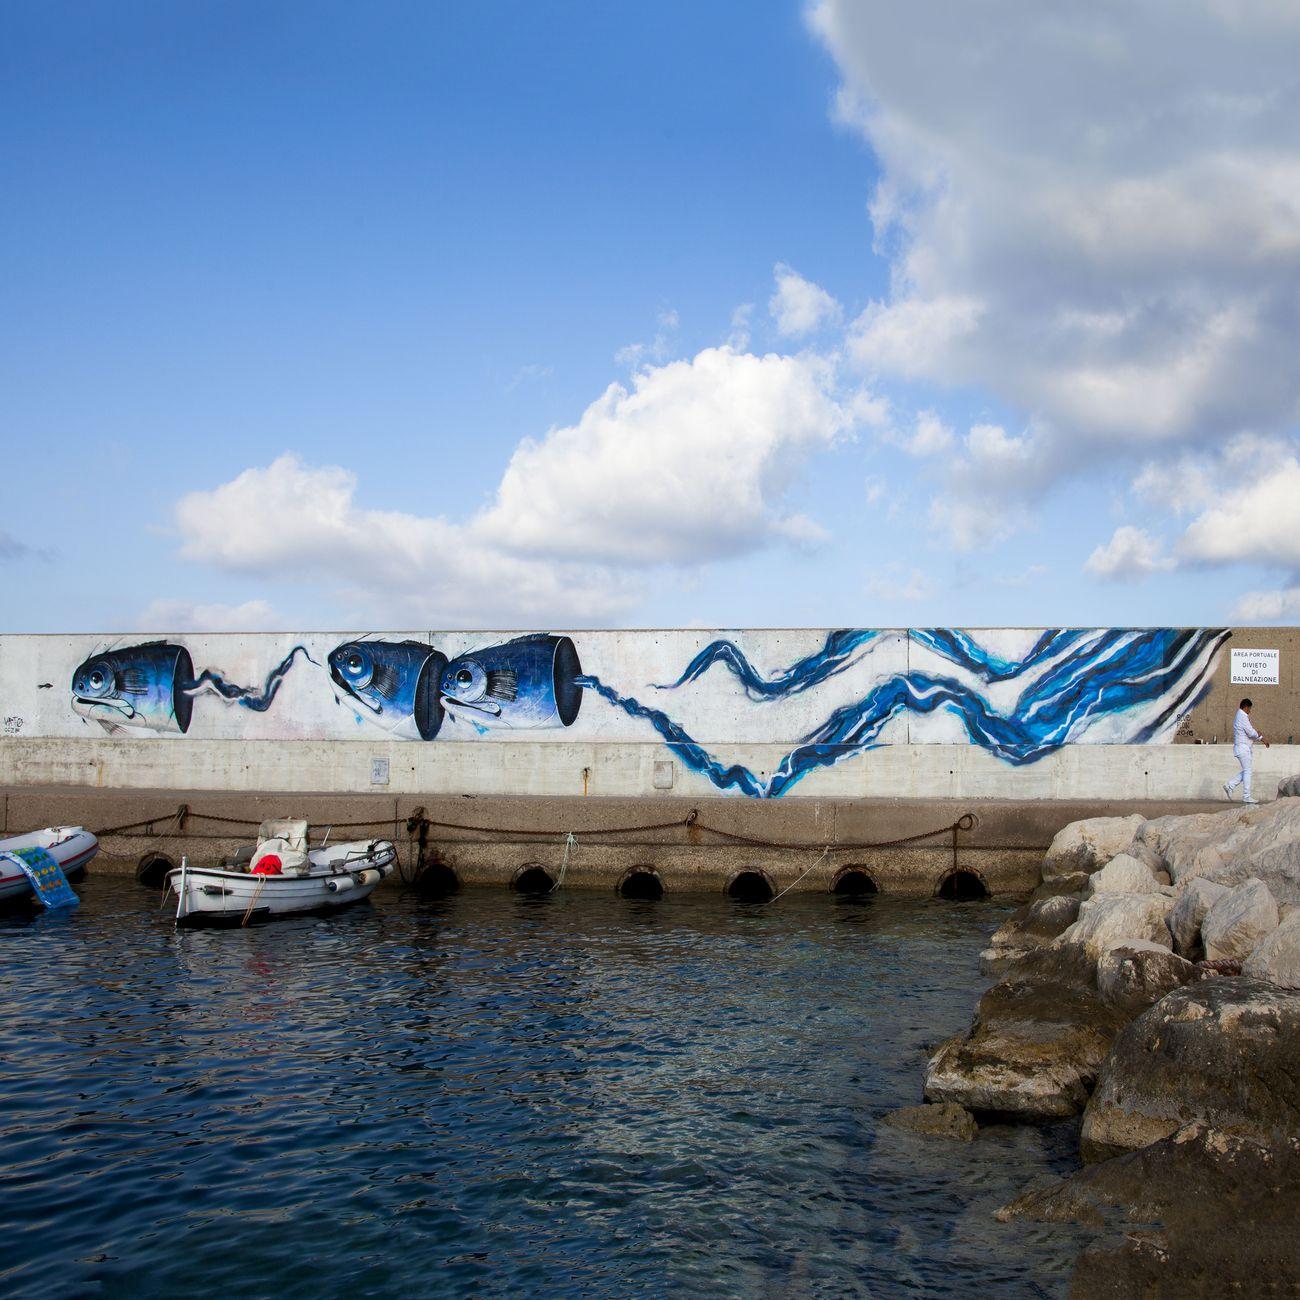 Urto, Blue flow, Isola di Ventotene 2018